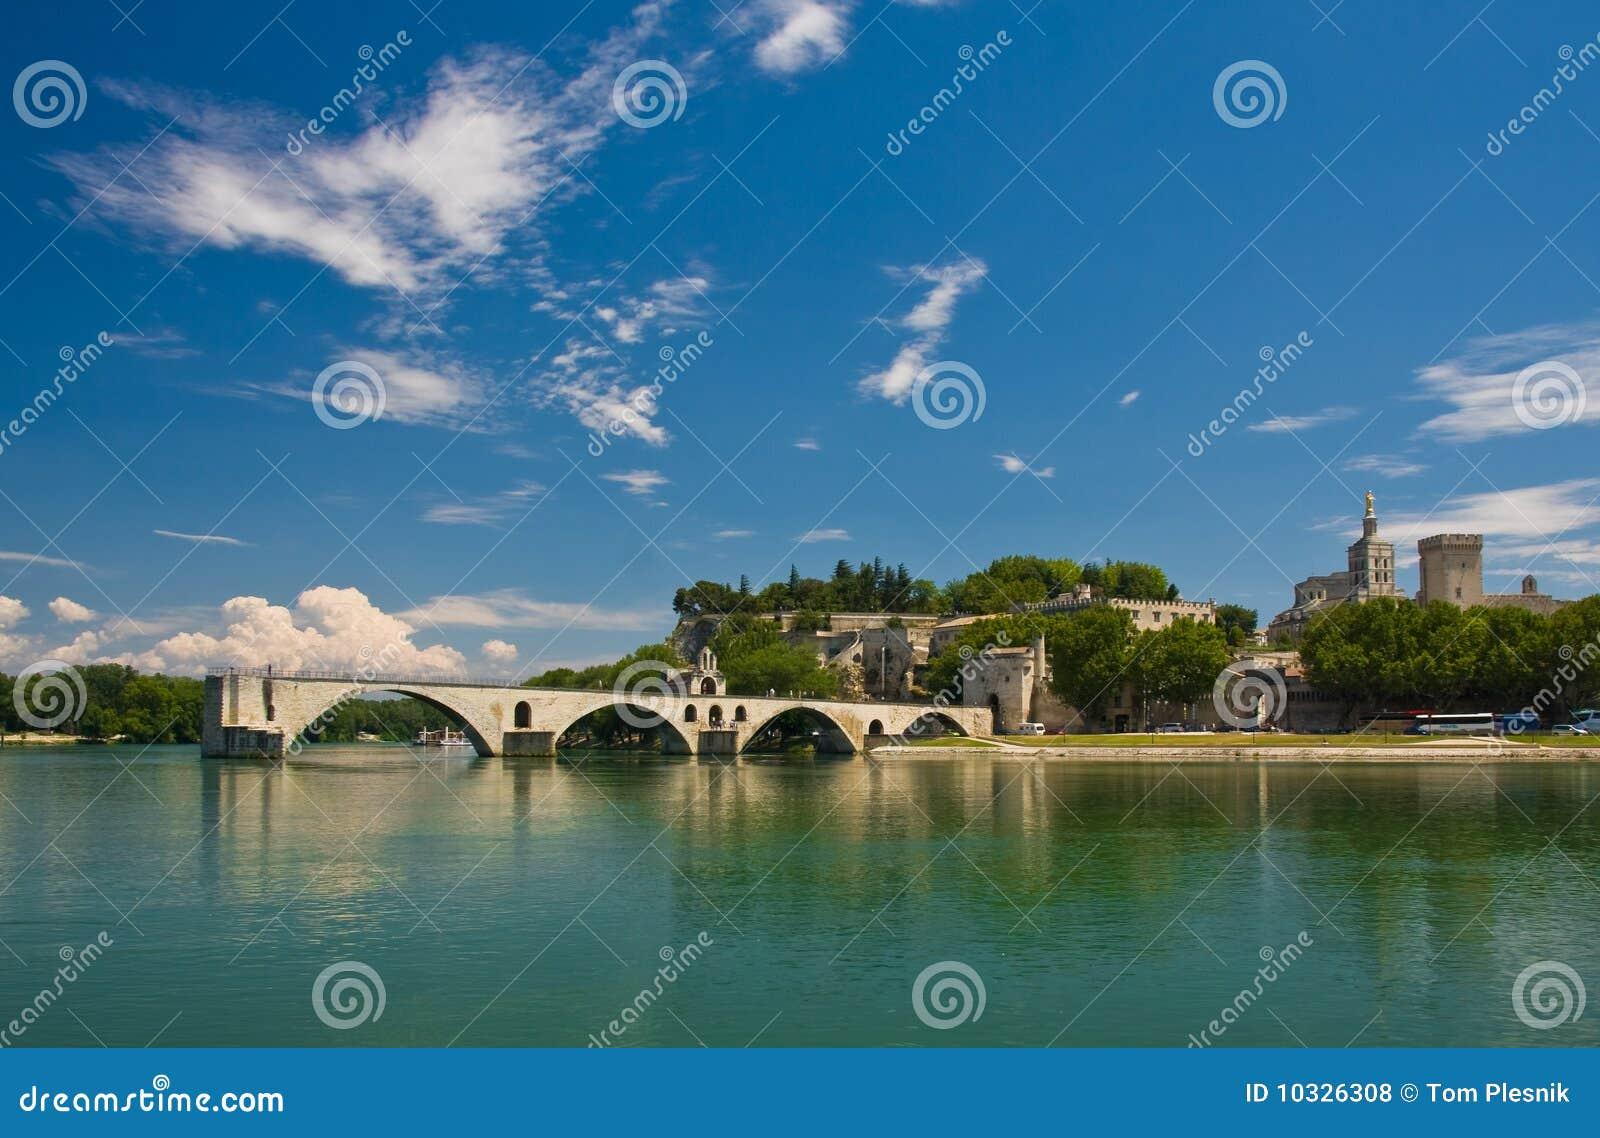 Famous Avignon Bridge